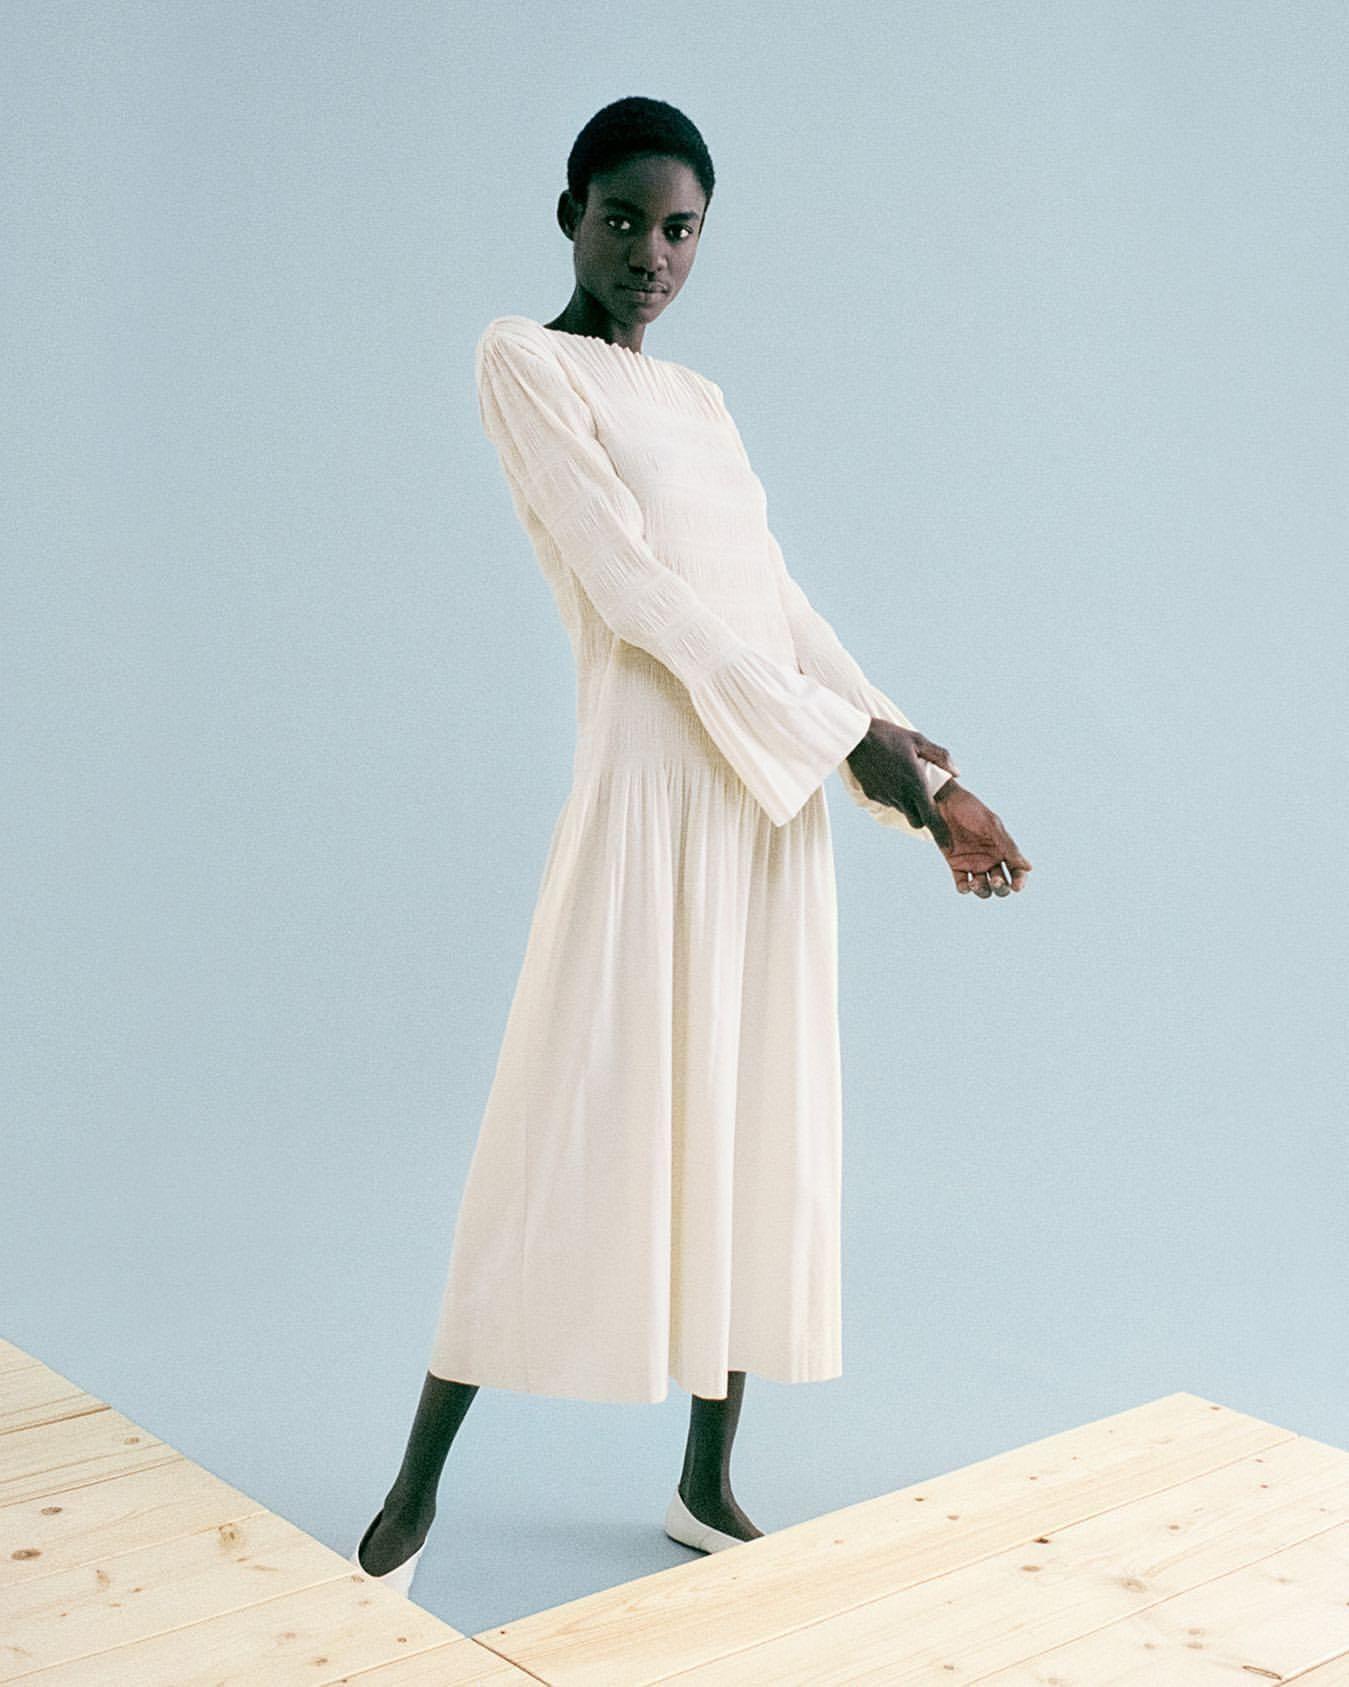 Get The Dress For 310 At Mytheresa Com Wheretoget In 2021 Mytheresa Dresses Buy Dress [ 1687 x 1349 Pixel ]